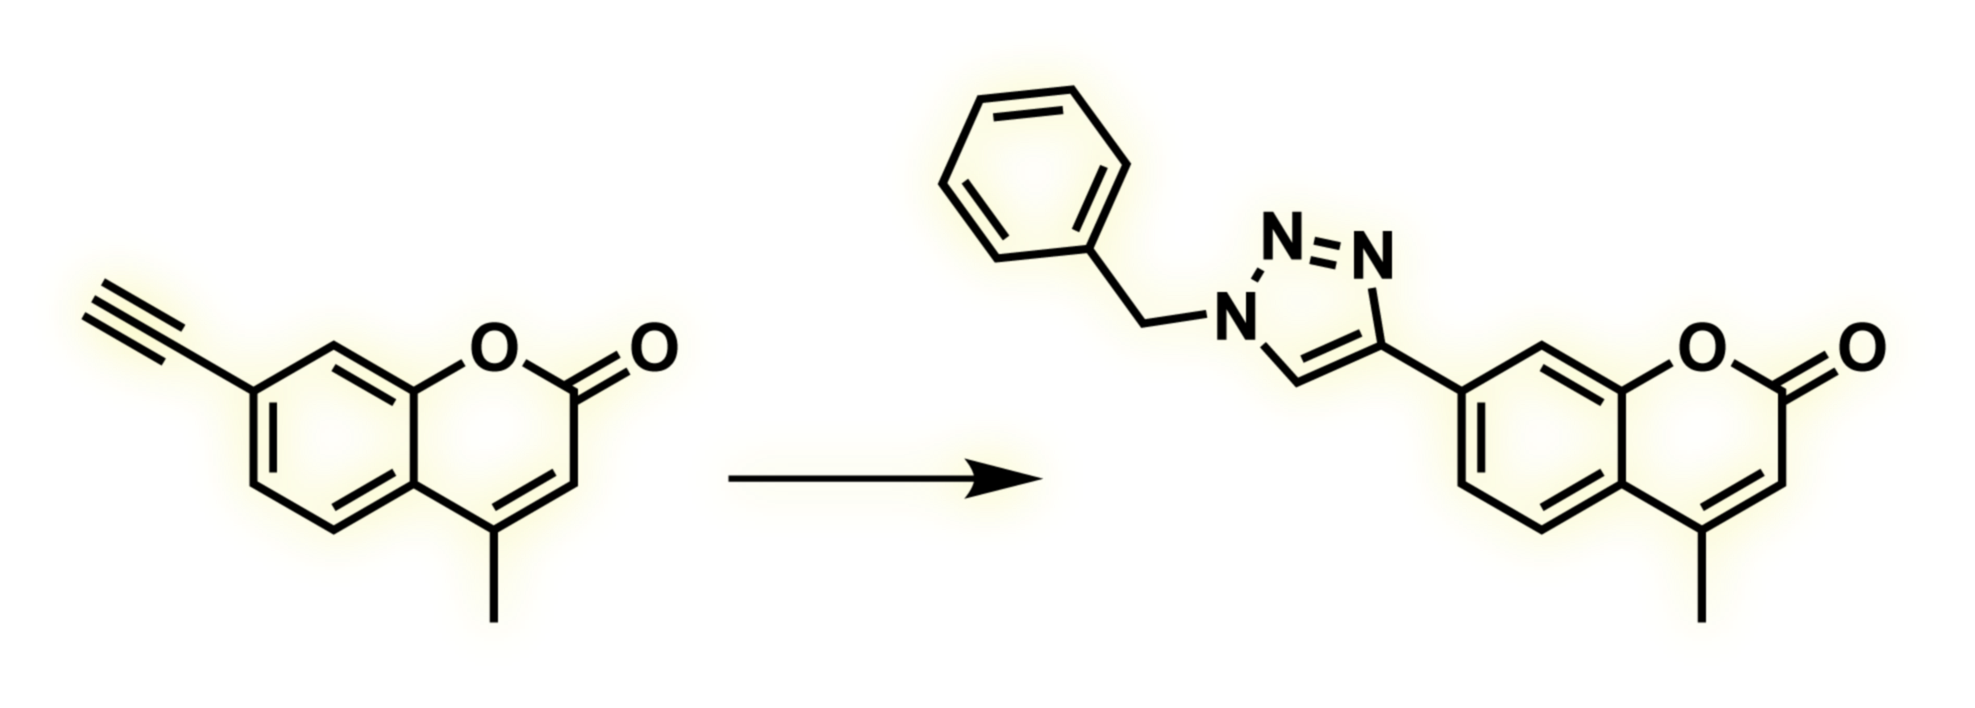 triazole fluorophores